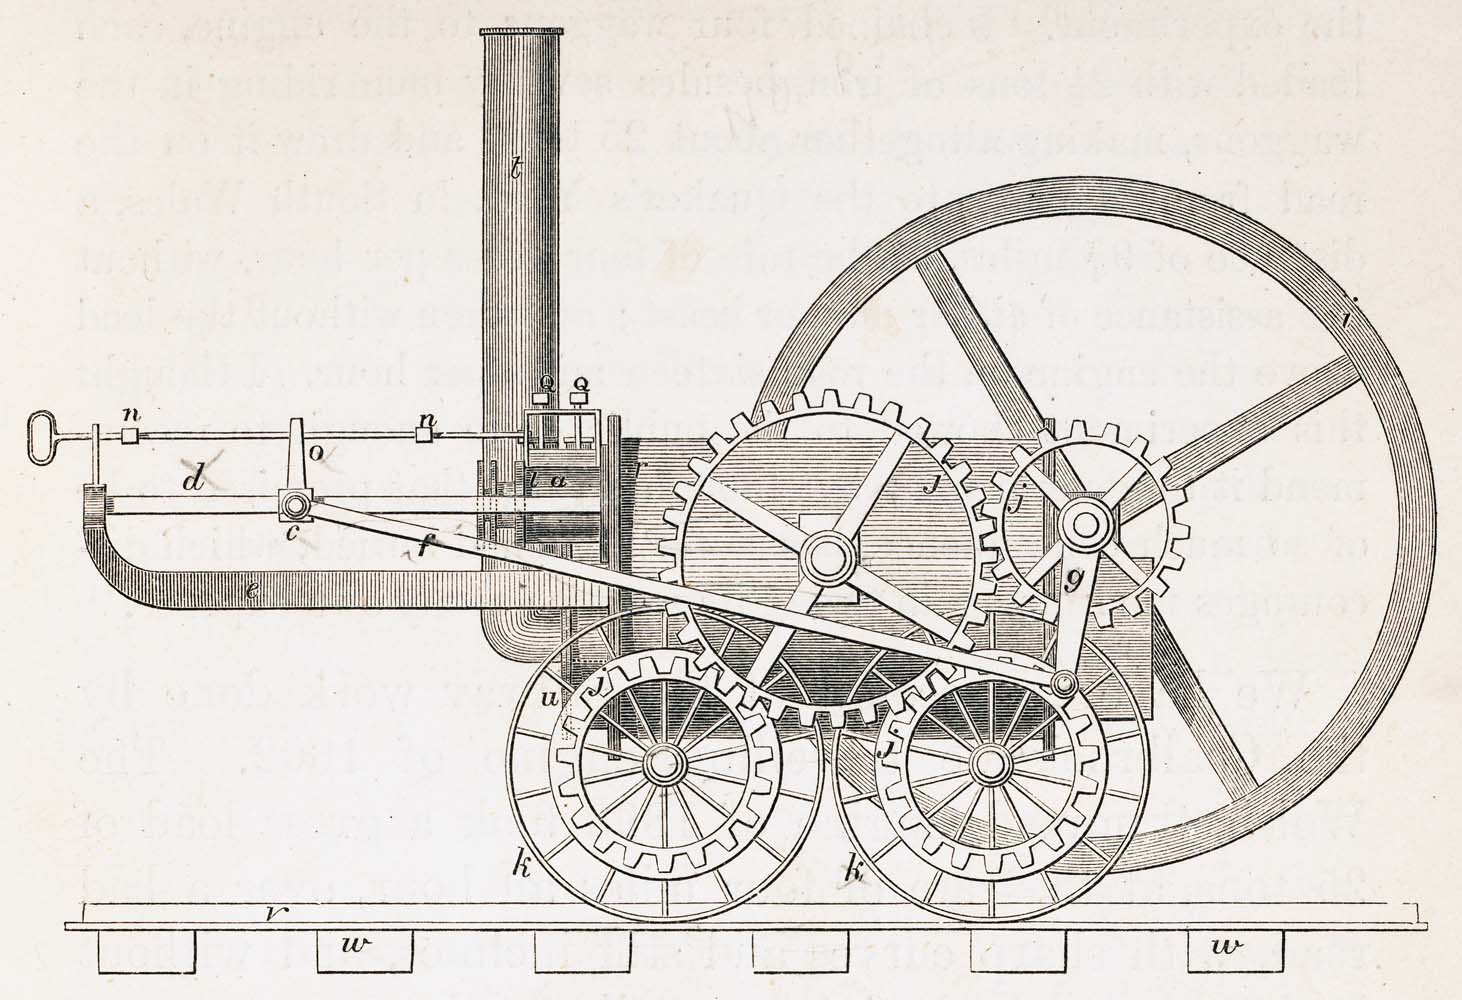 trevithick's tramroad locomotive